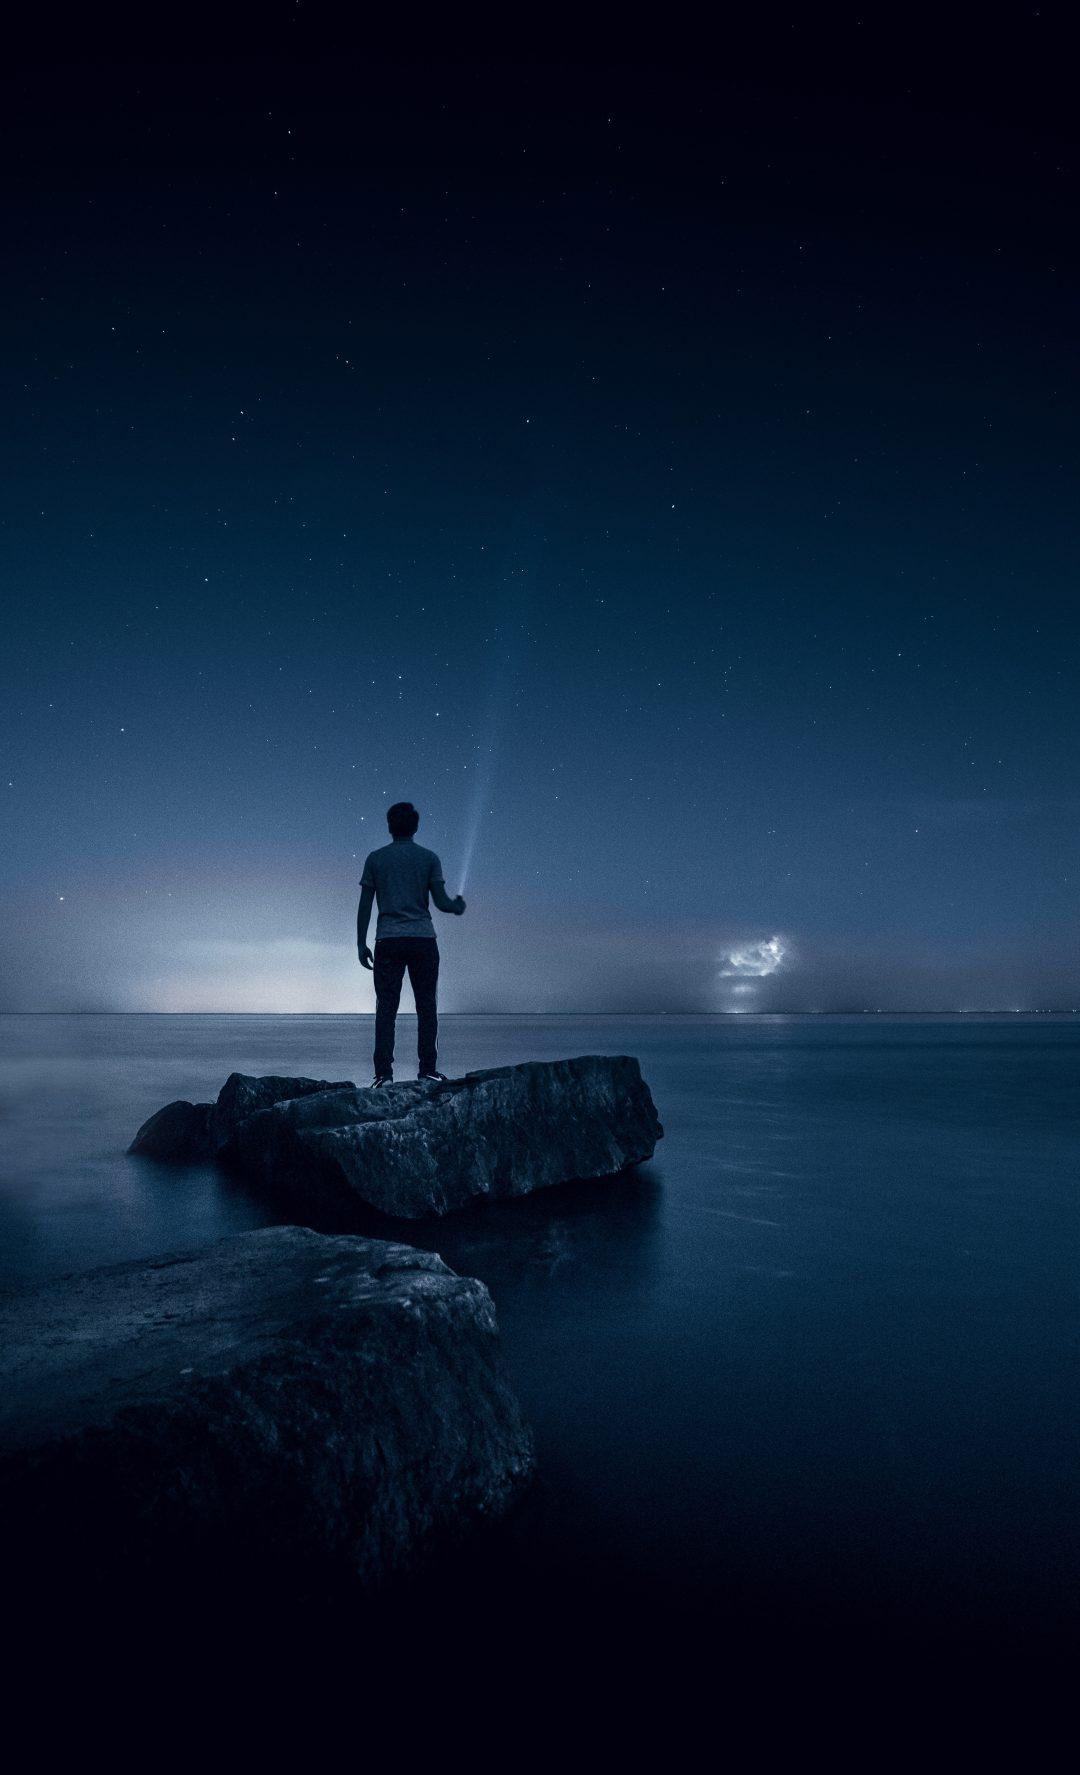 alone boy wallpaper,sky,blue,water,sea,horizon